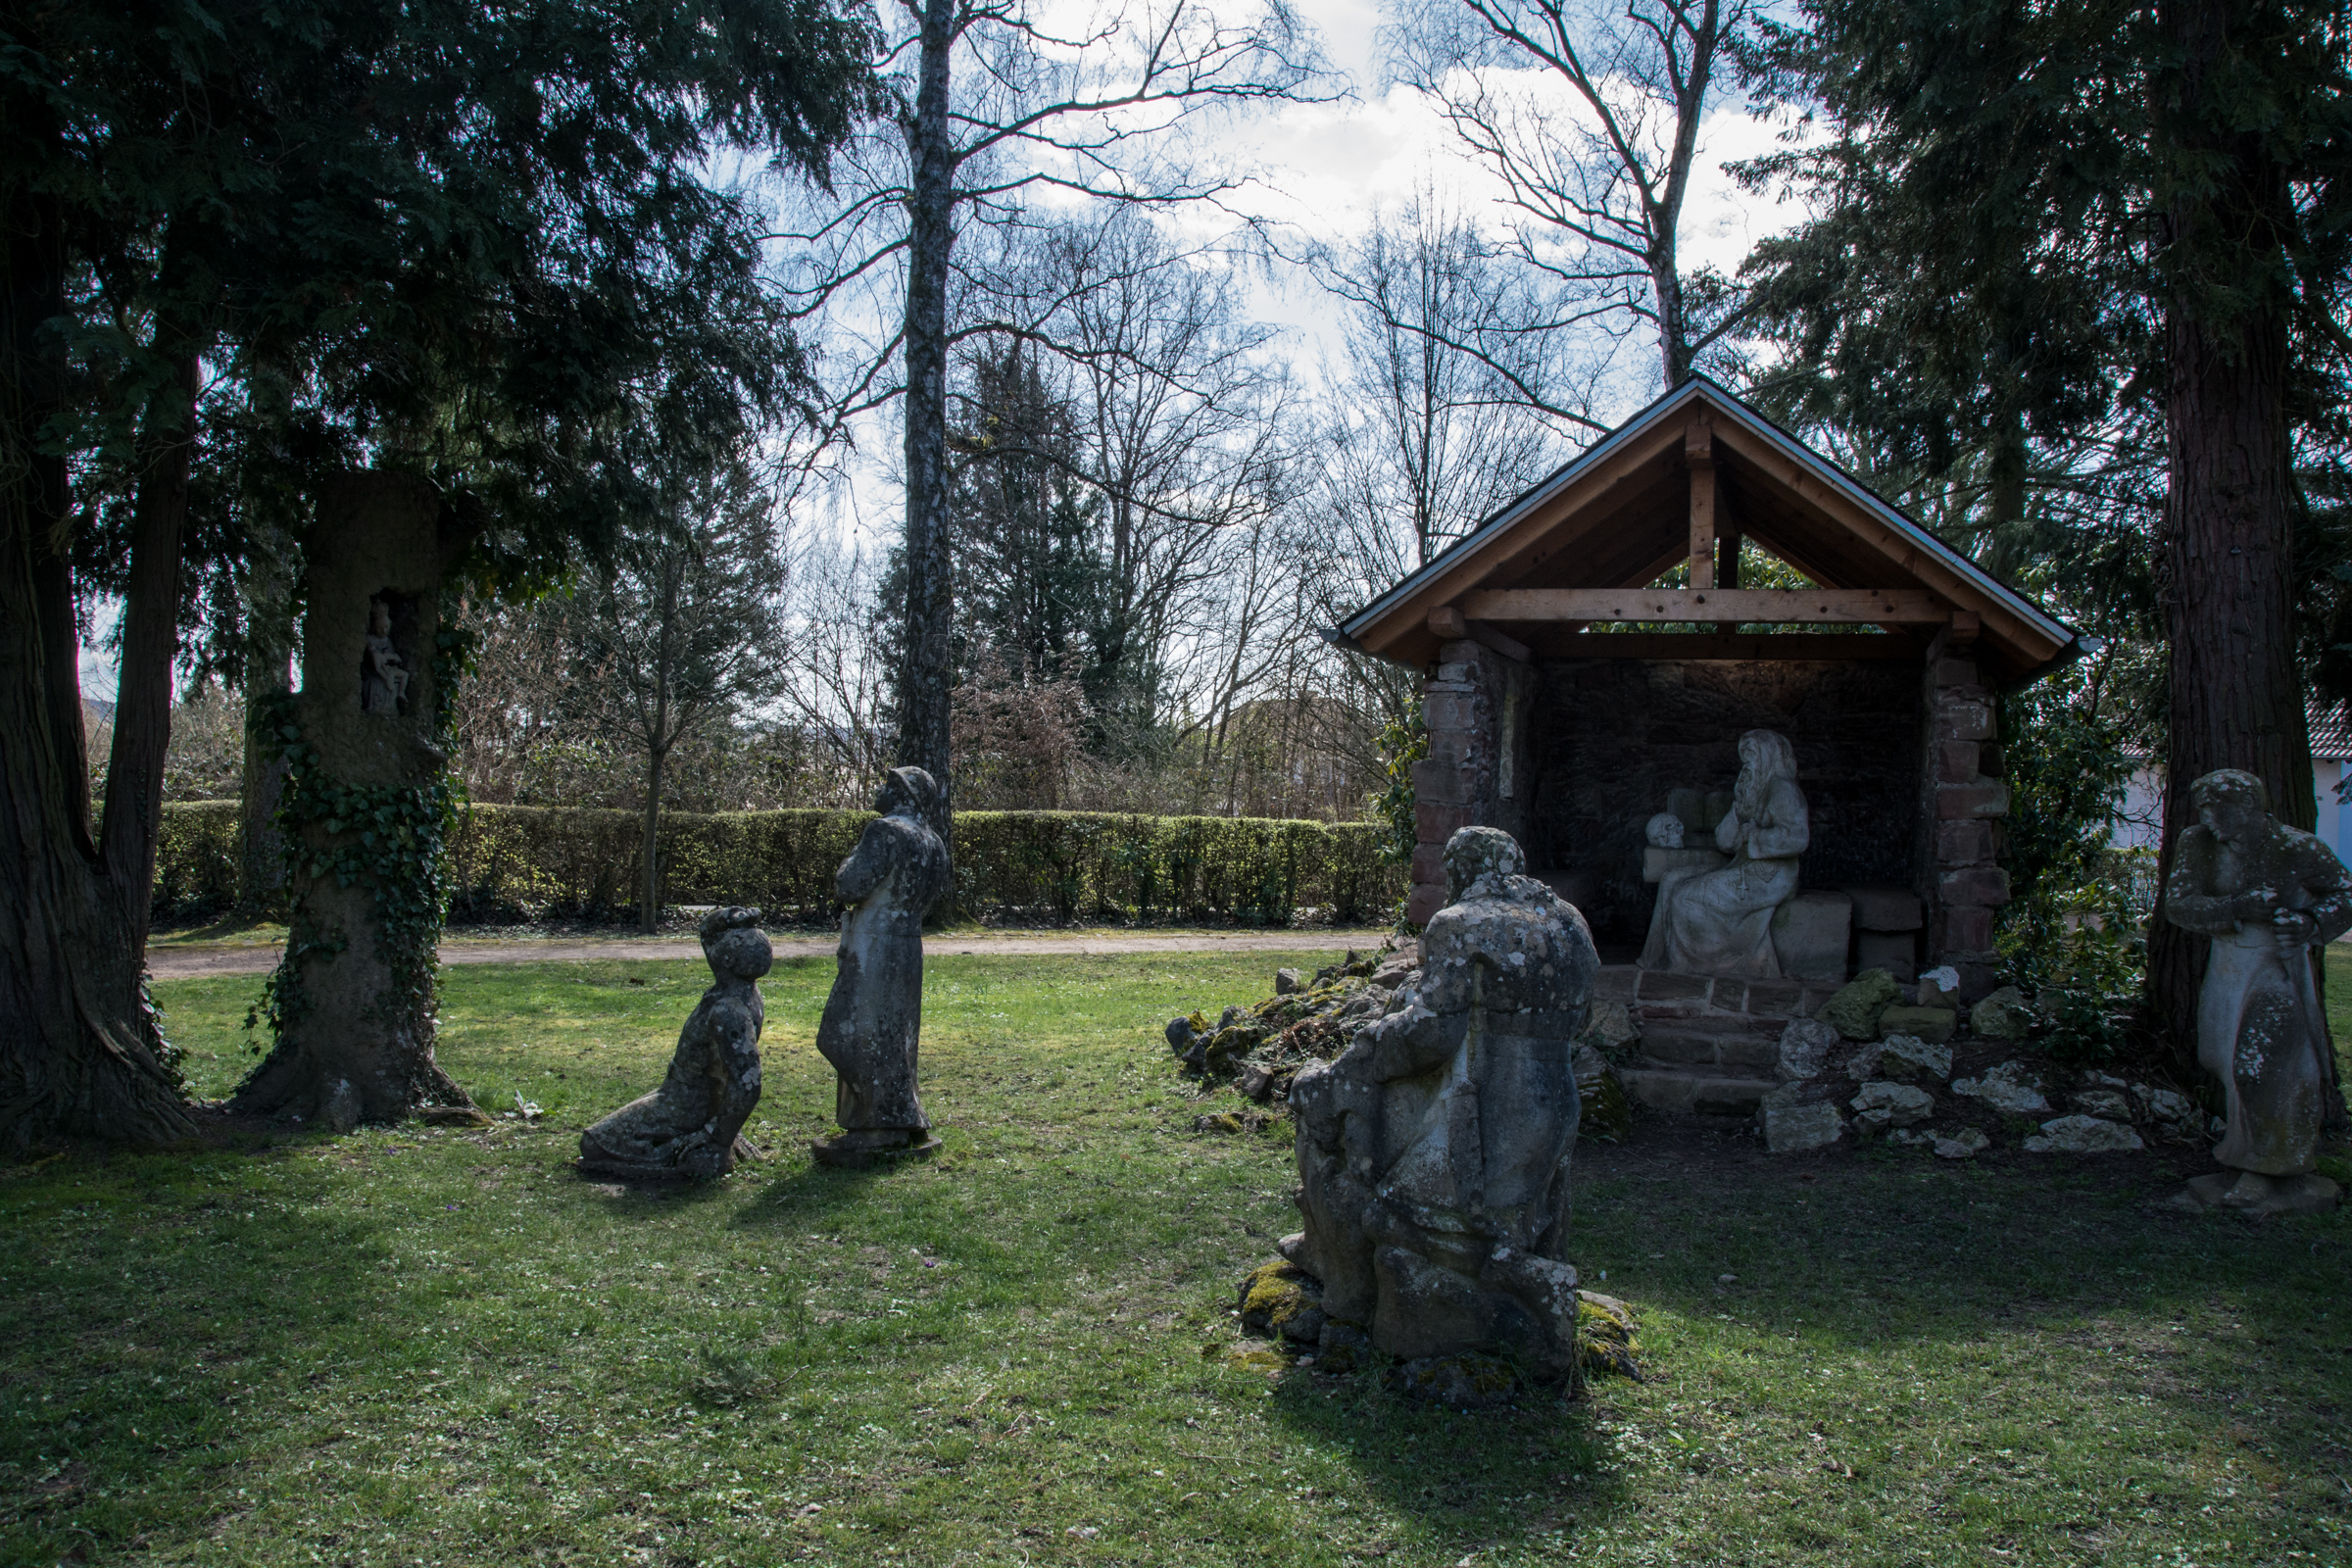 Kloster   Blieskastel   Saar-Pfalz   Saarland